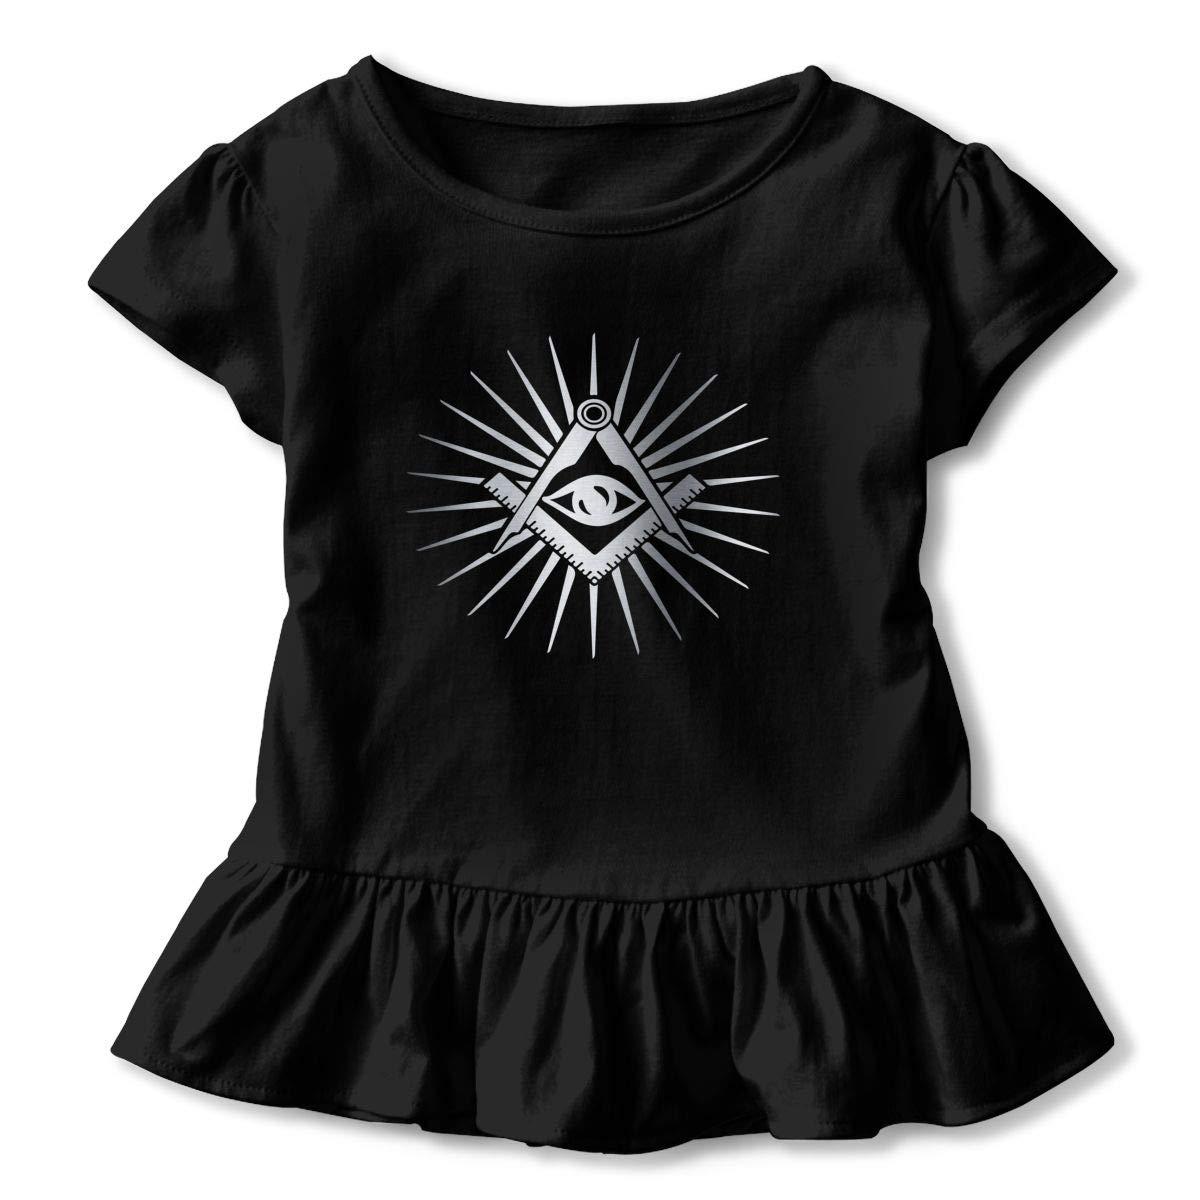 Clarissa Bertha Freemason All Seeing Eyes Toddler Baby Girls Short Sleeve Ruffle T-Shirt